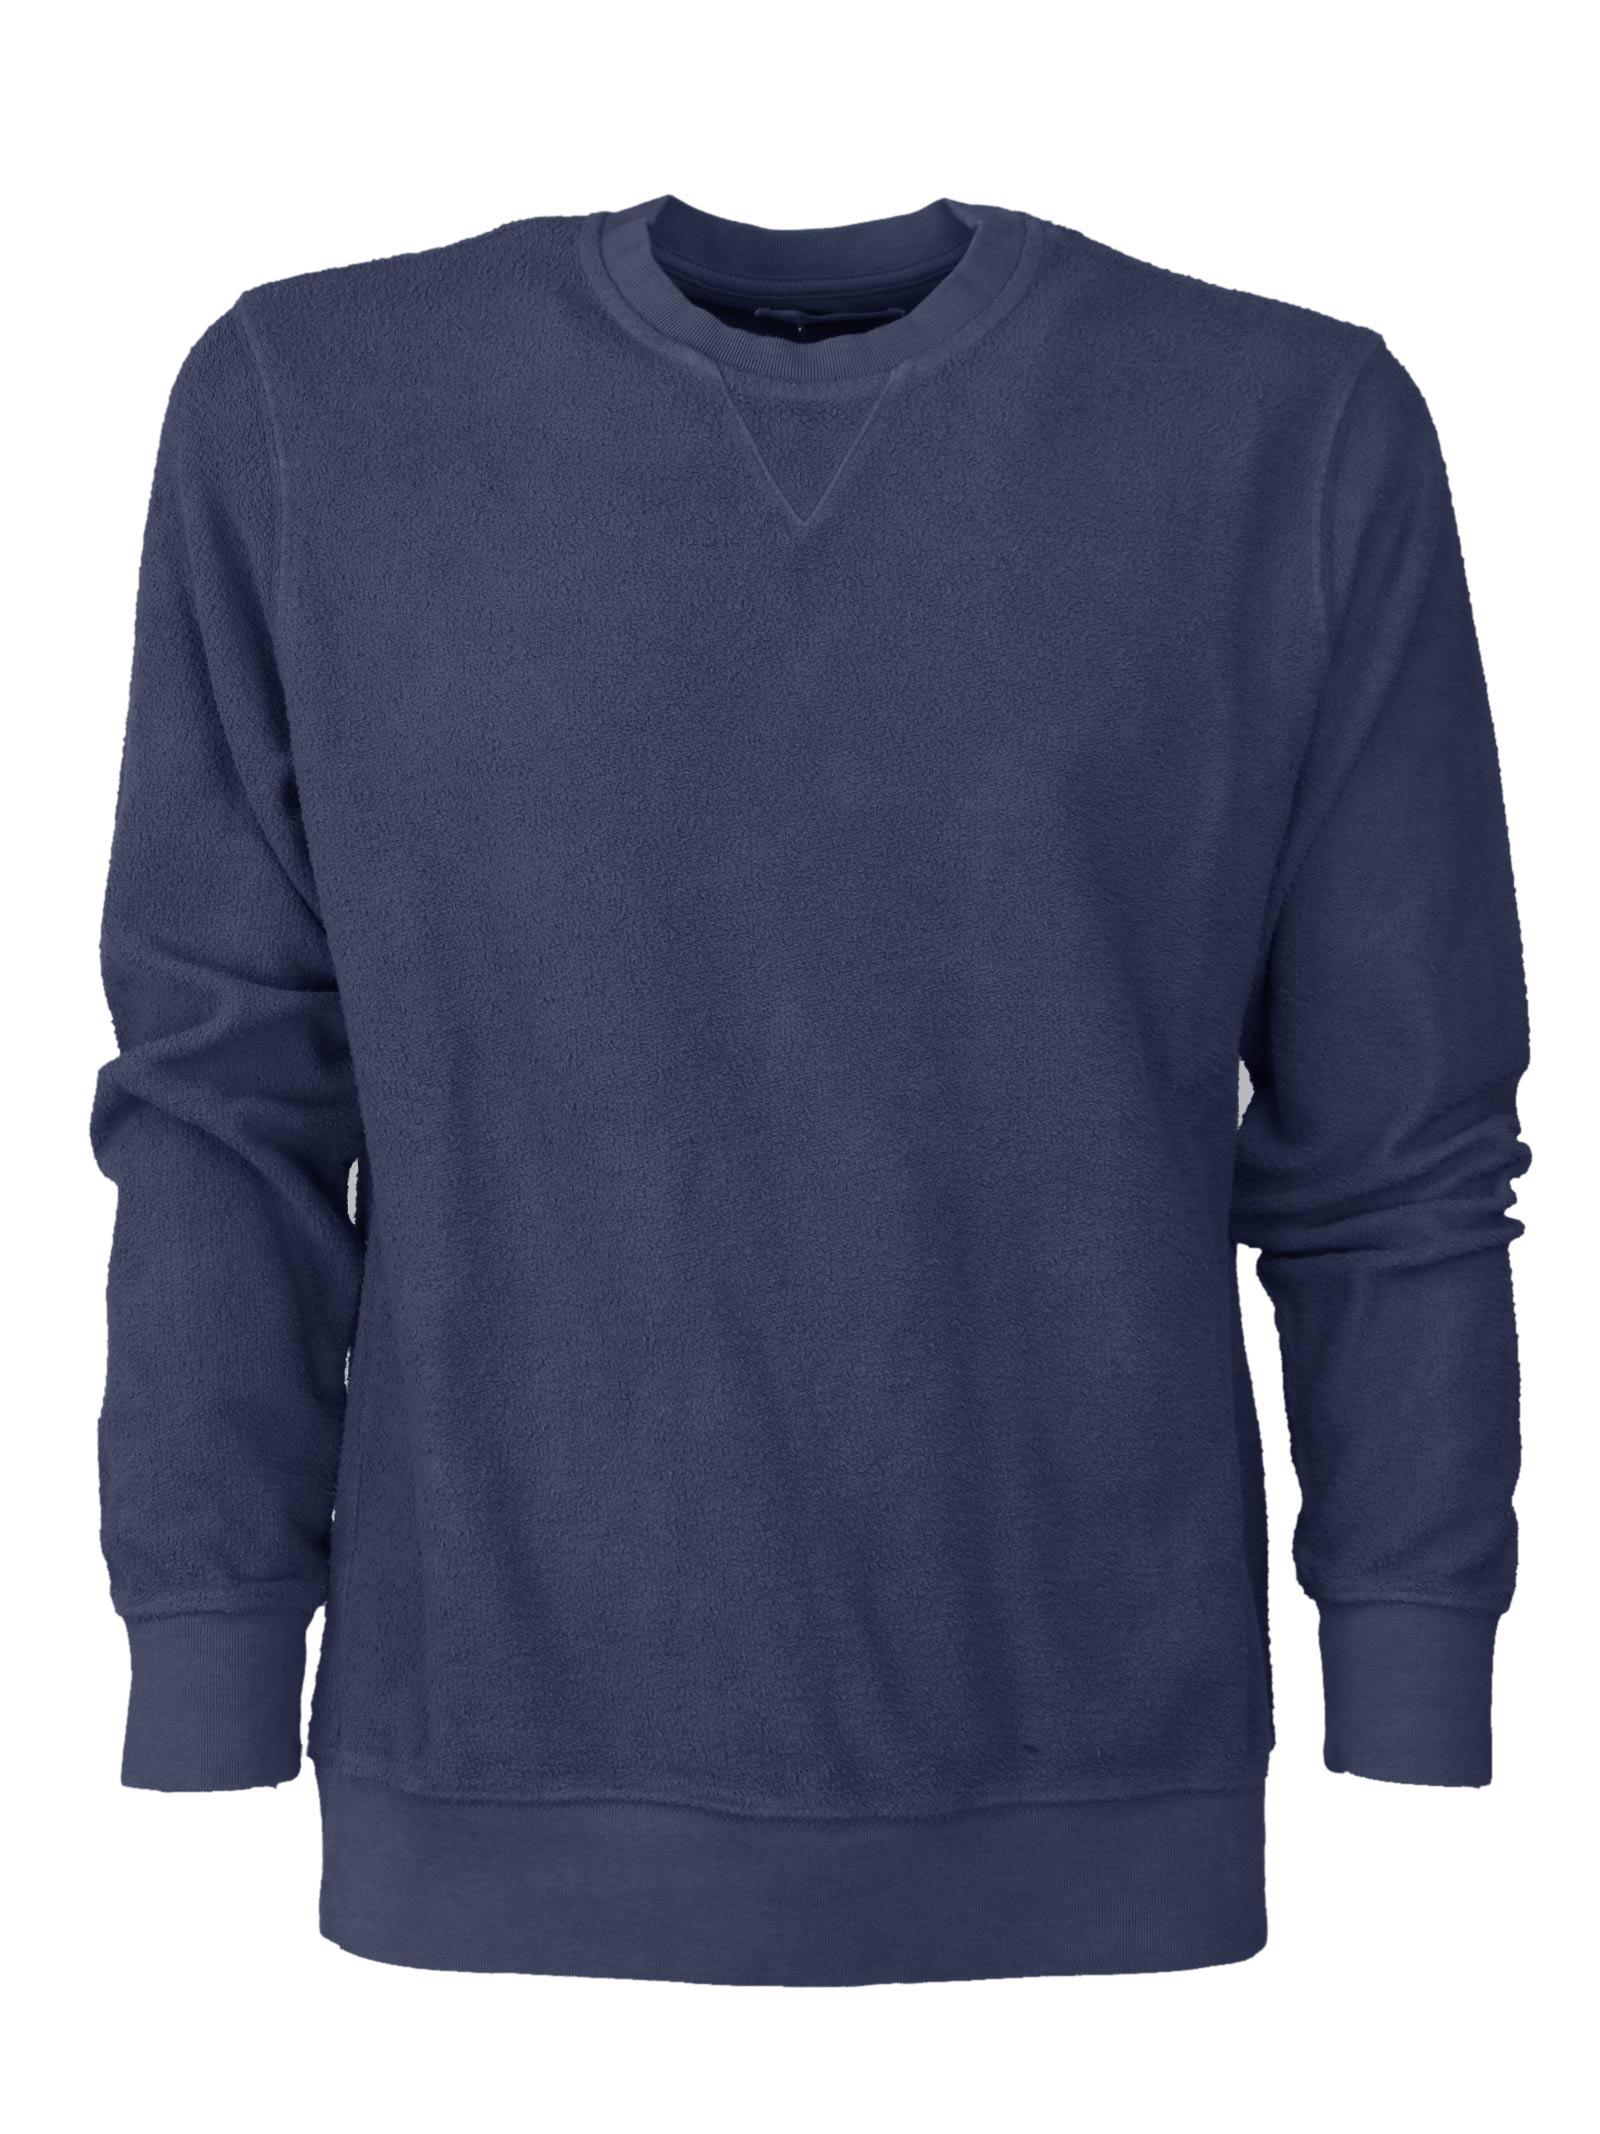 crew neck sweat shirt WOOL & CO. | Sweats | 822522